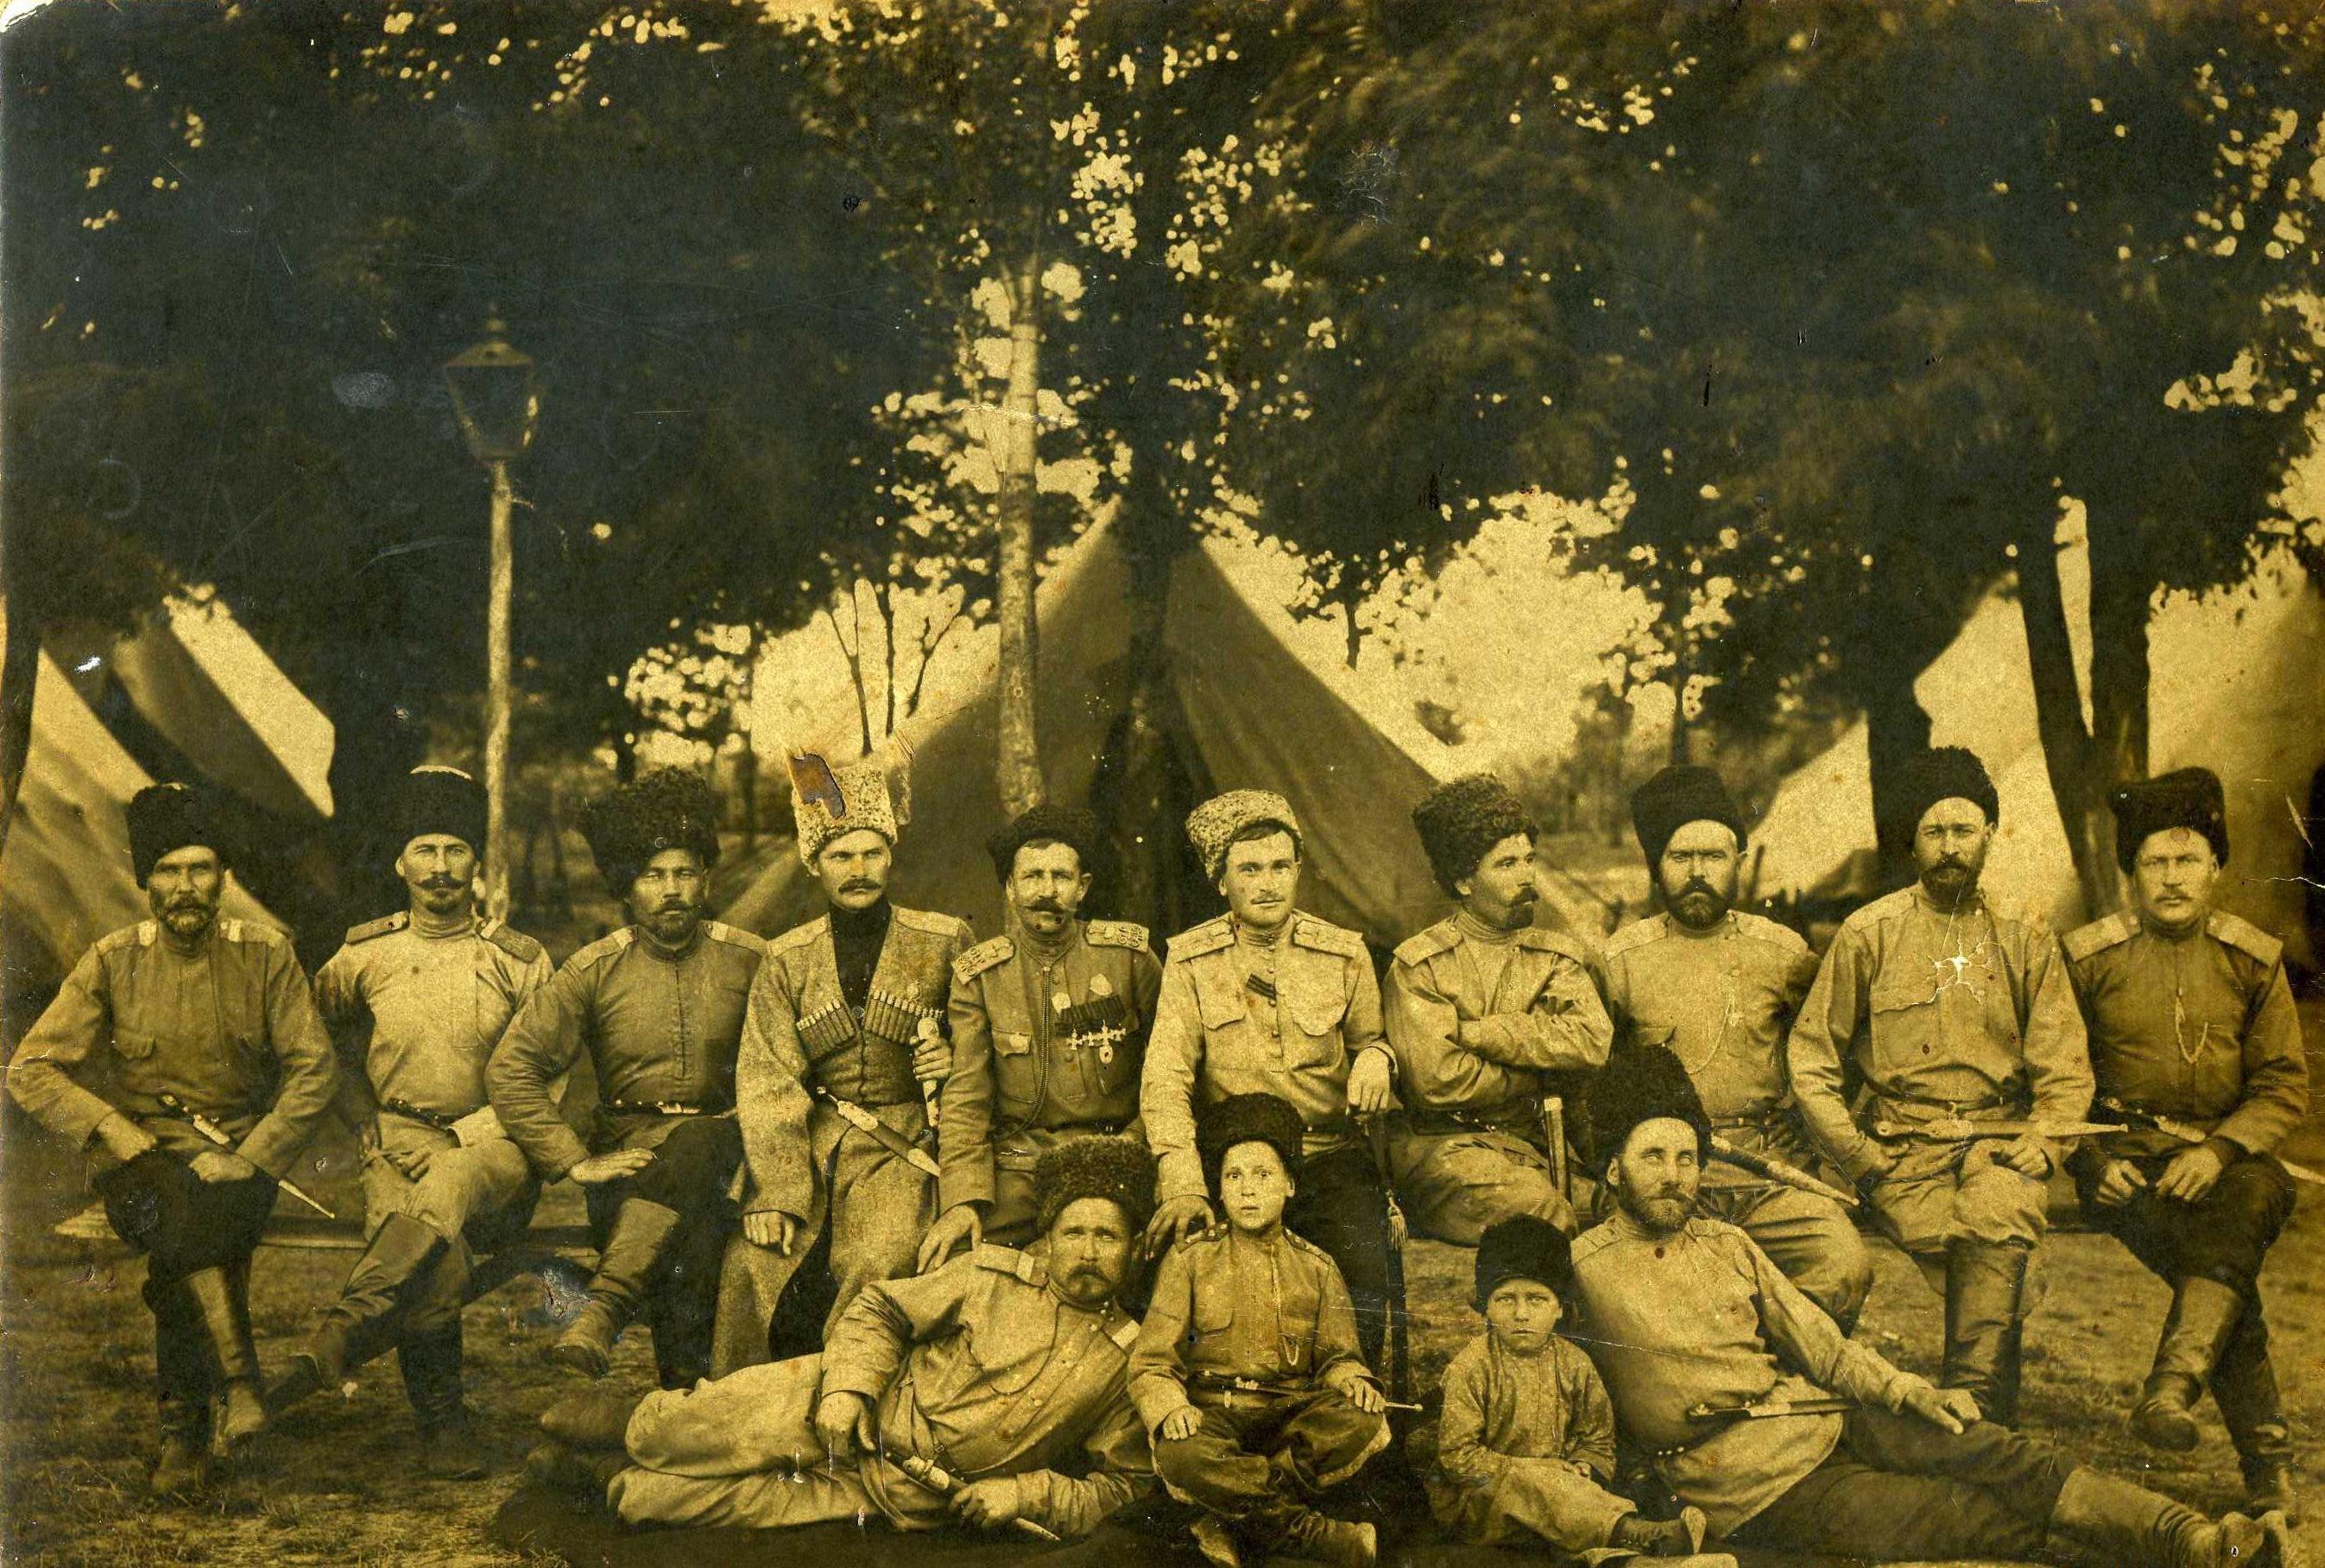 ناصرالدین شاه و تاسیس دیویزیون قزاق